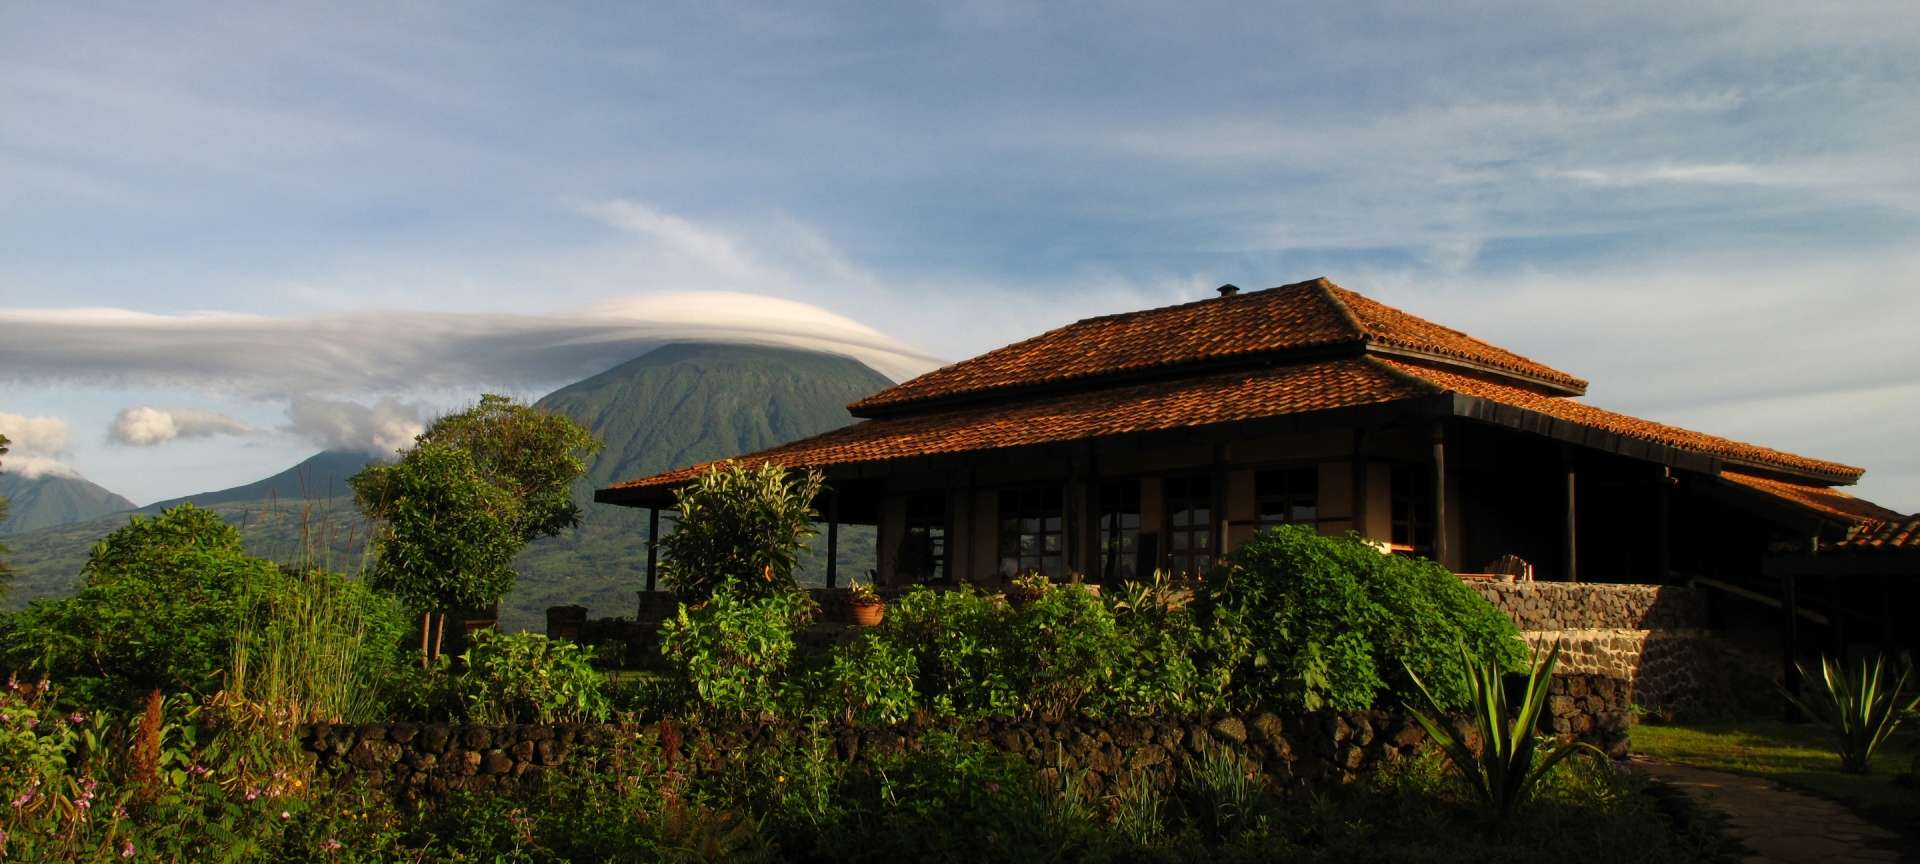 Virunga Lodge Exterior view